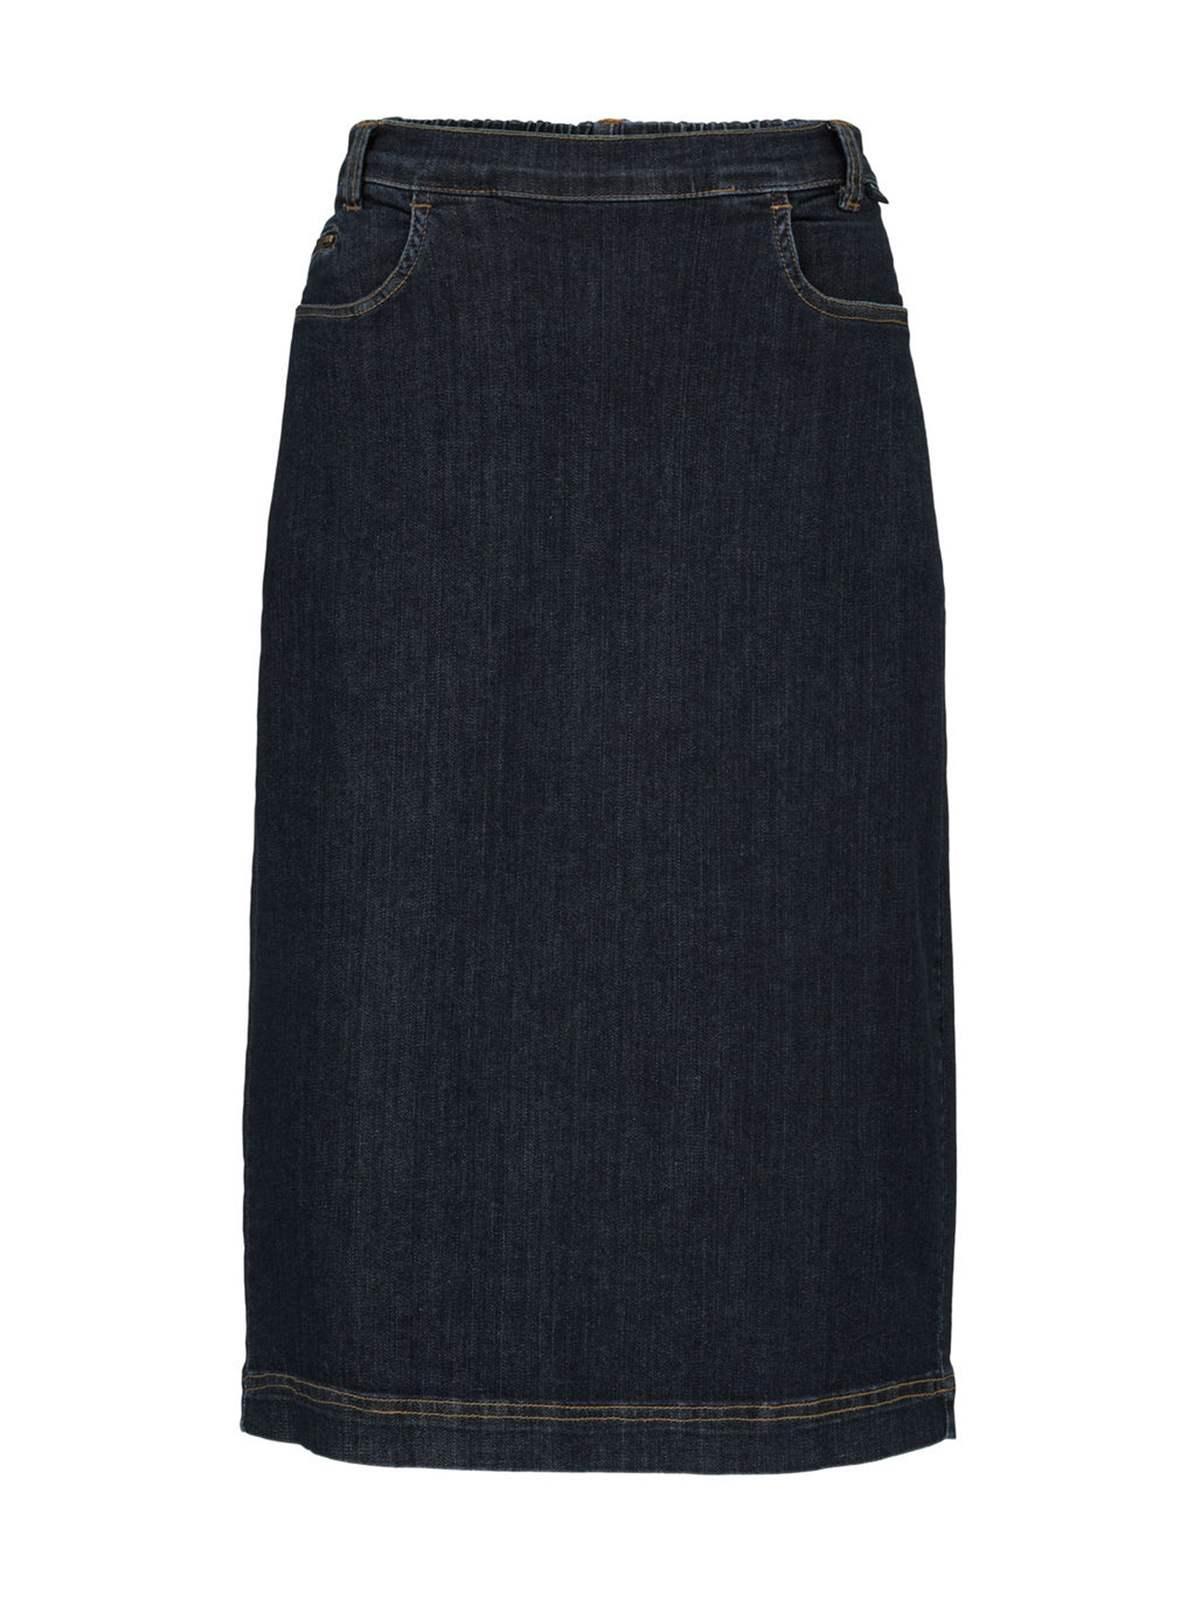 6a15c0e4842a1 Saba Skirt Masai Clothing Katie Kerr Womens Clothing